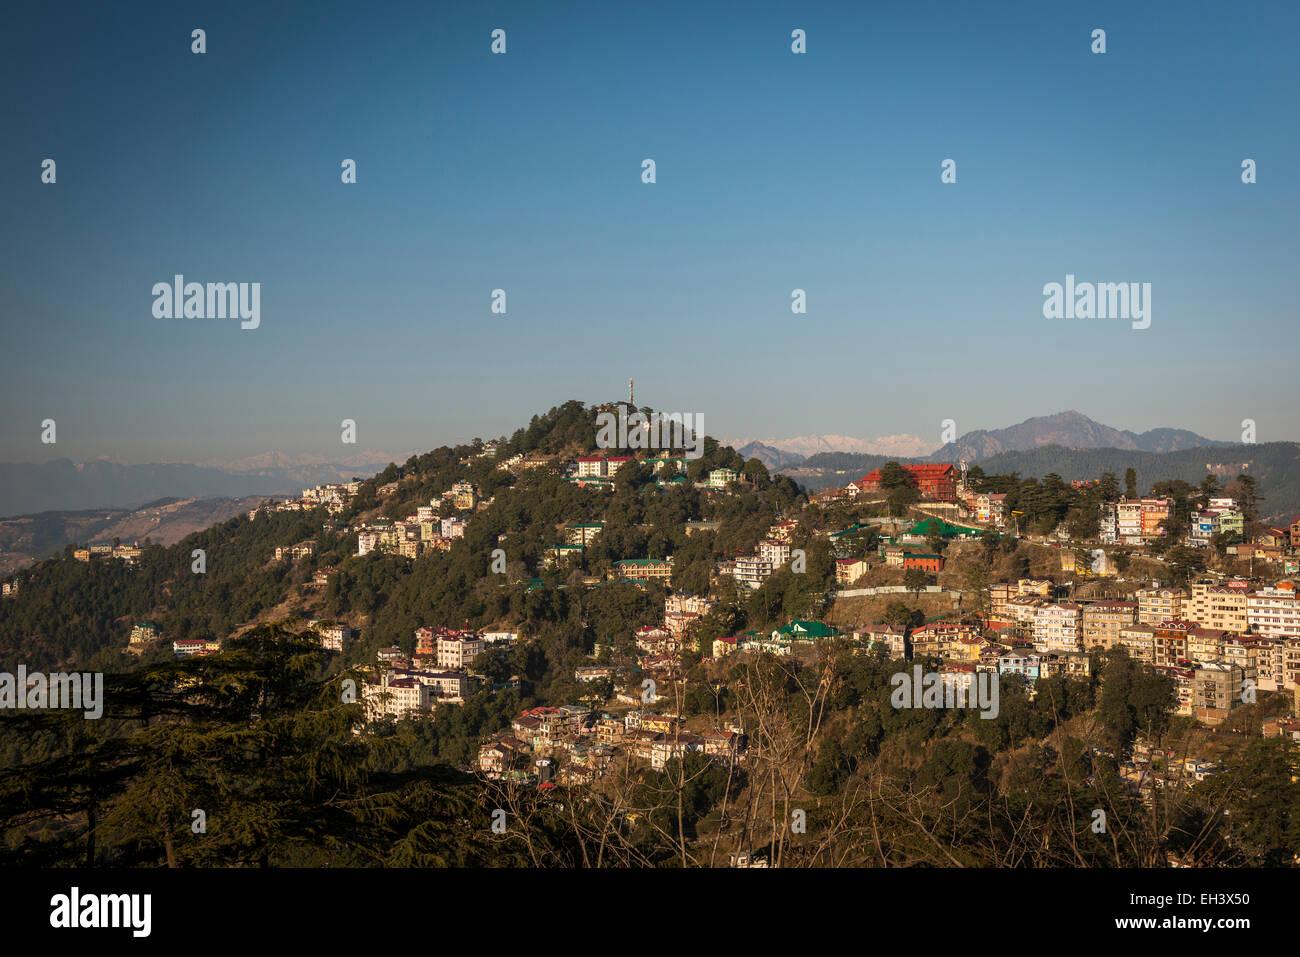 Vista dalla cresta, Shimla, Himachal Pradesh, India Foto Stock